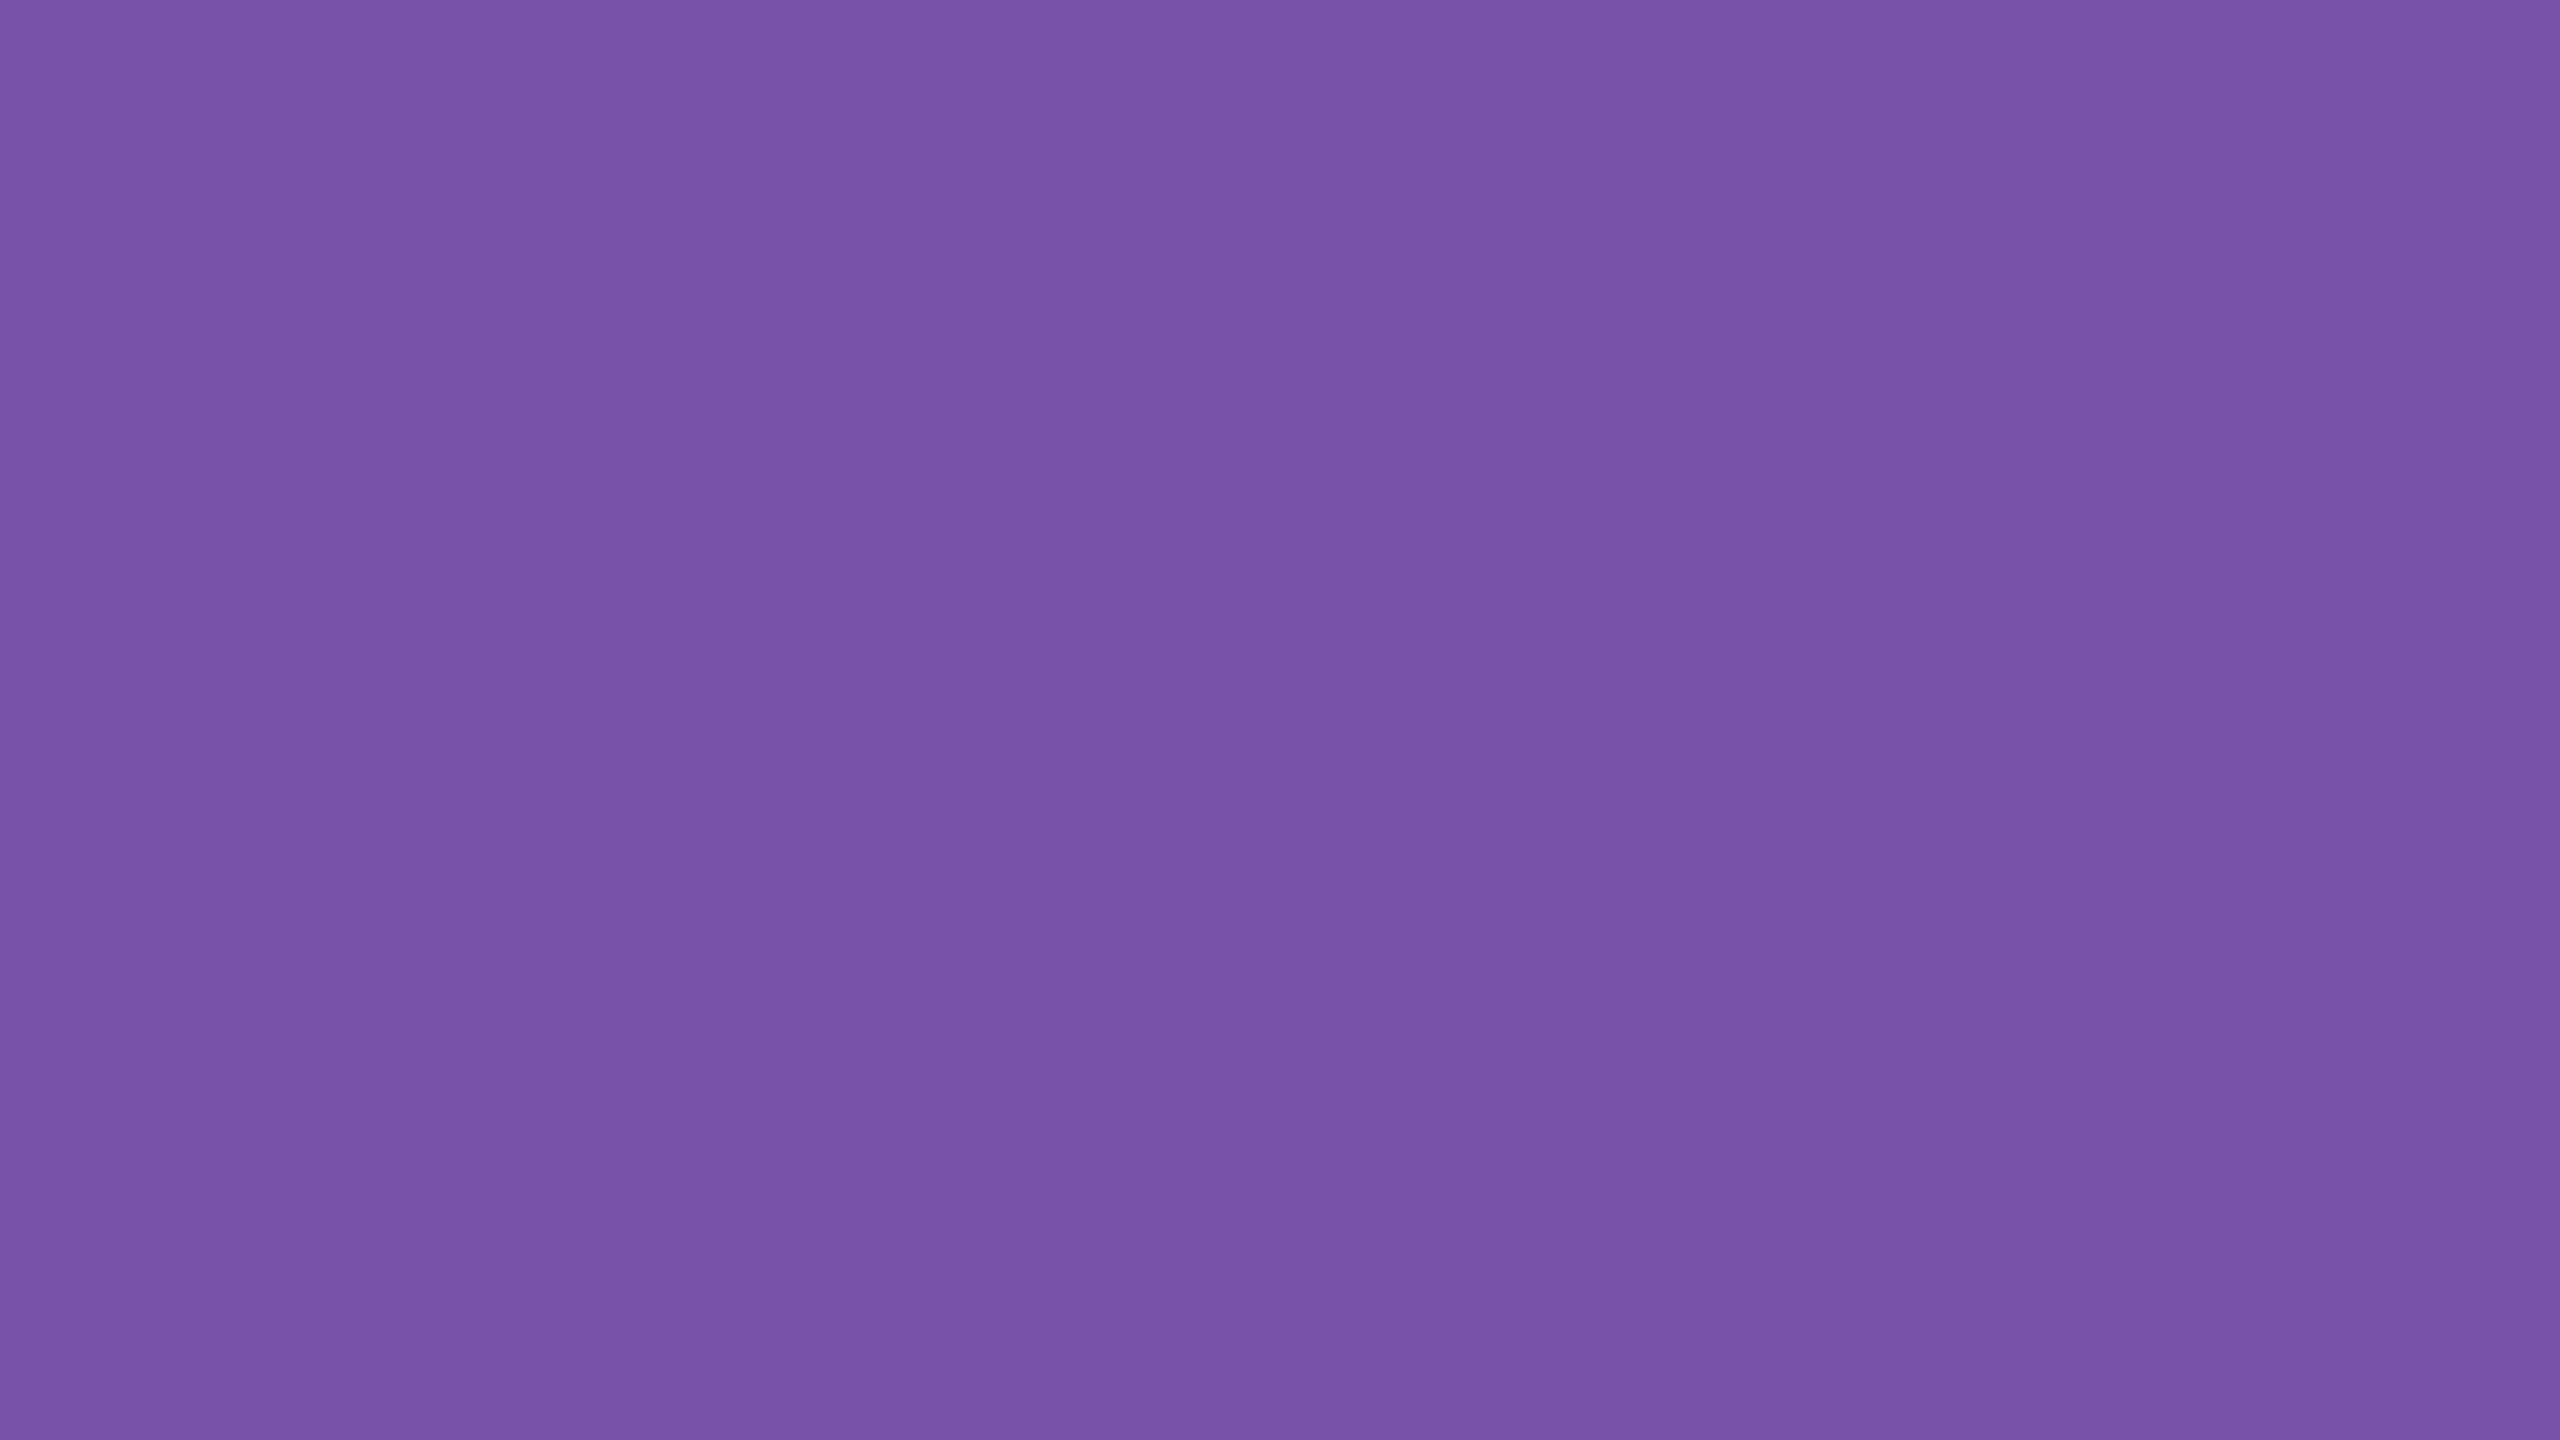 Purple color background wallpapersafari - Wallpaper lavender color ...